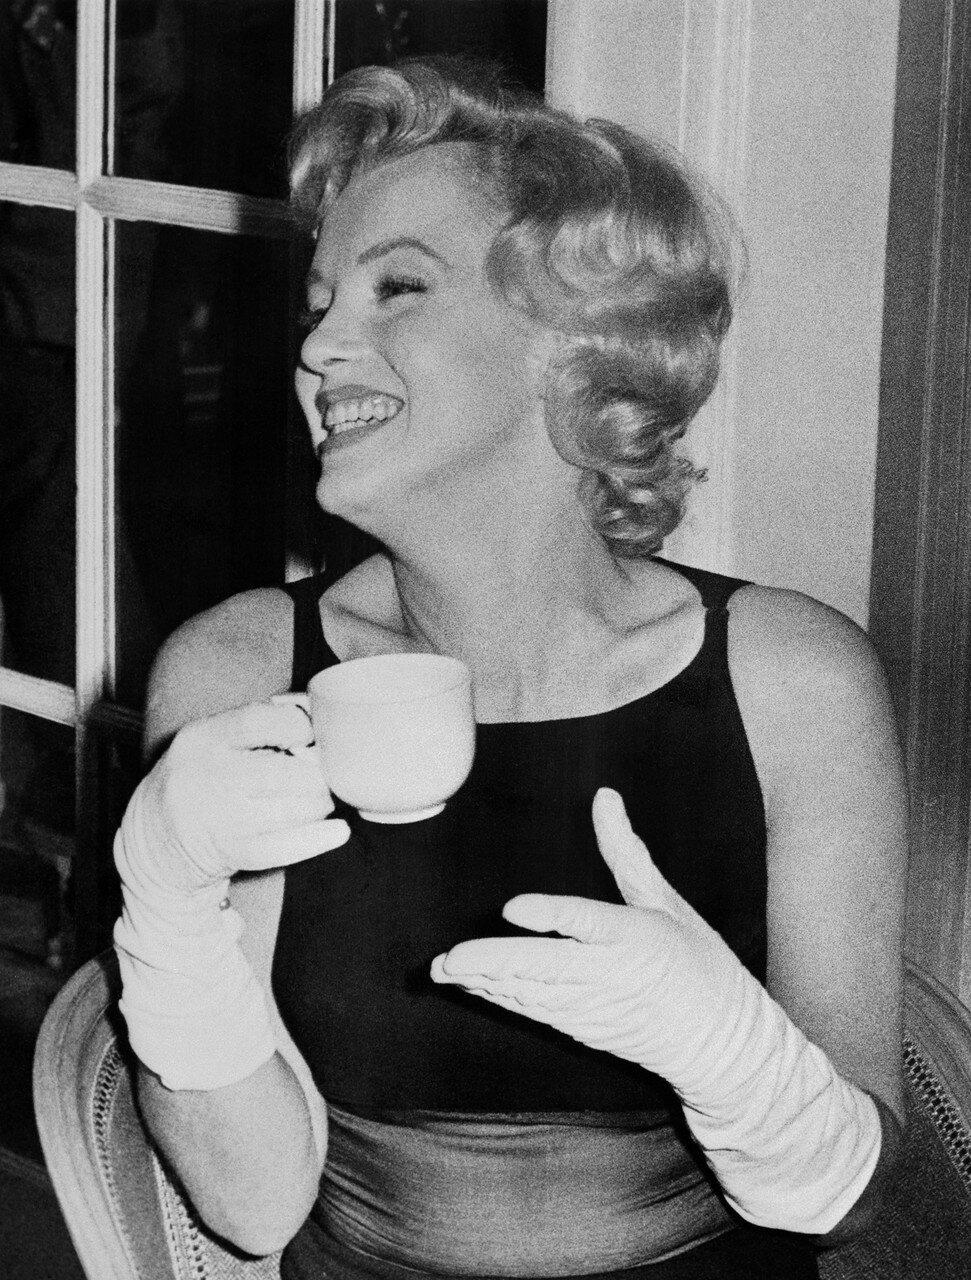 Marilyn Monroe Holding Tea Cup